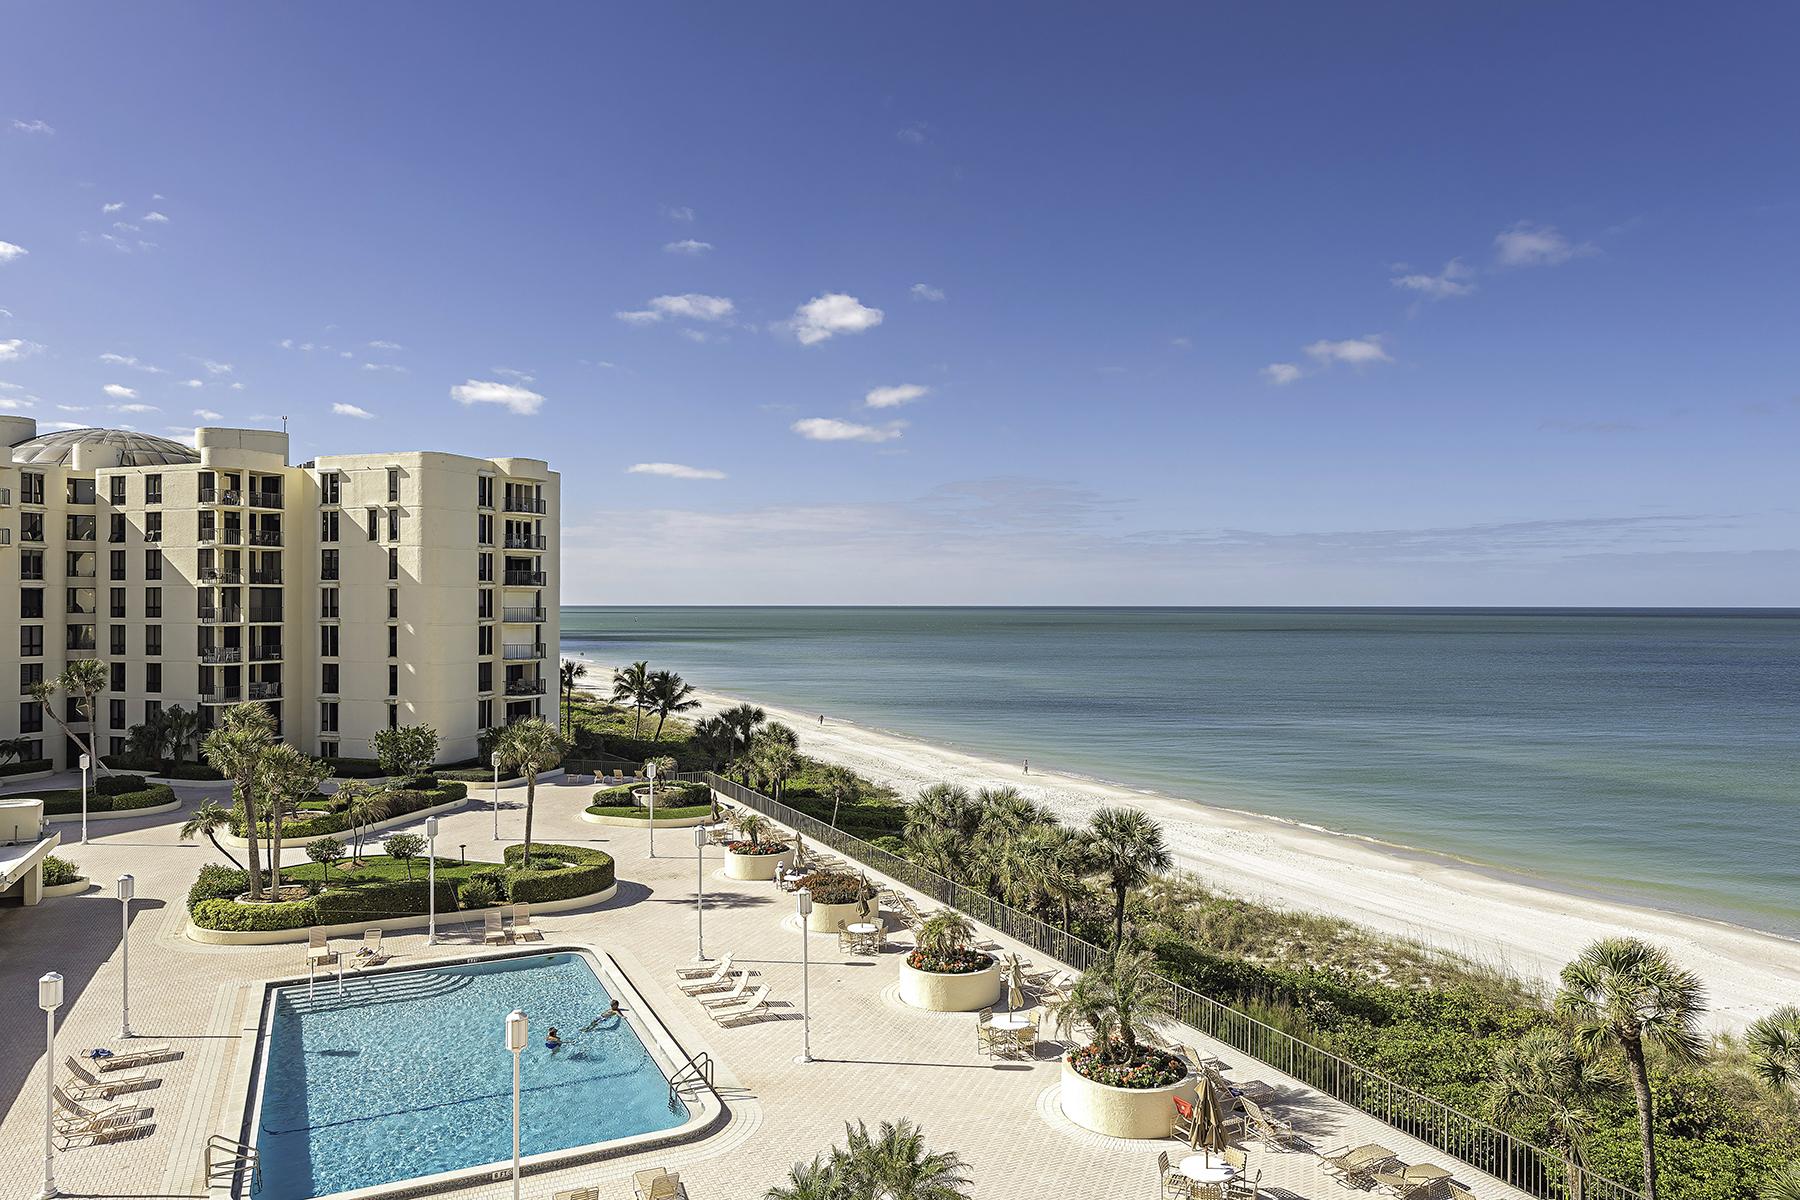 Кооперативная квартира для того Продажа на Moorings 3215 Gulf Shore Blvd N 504N Naples, Флорида, 34103 Соединенные Штаты